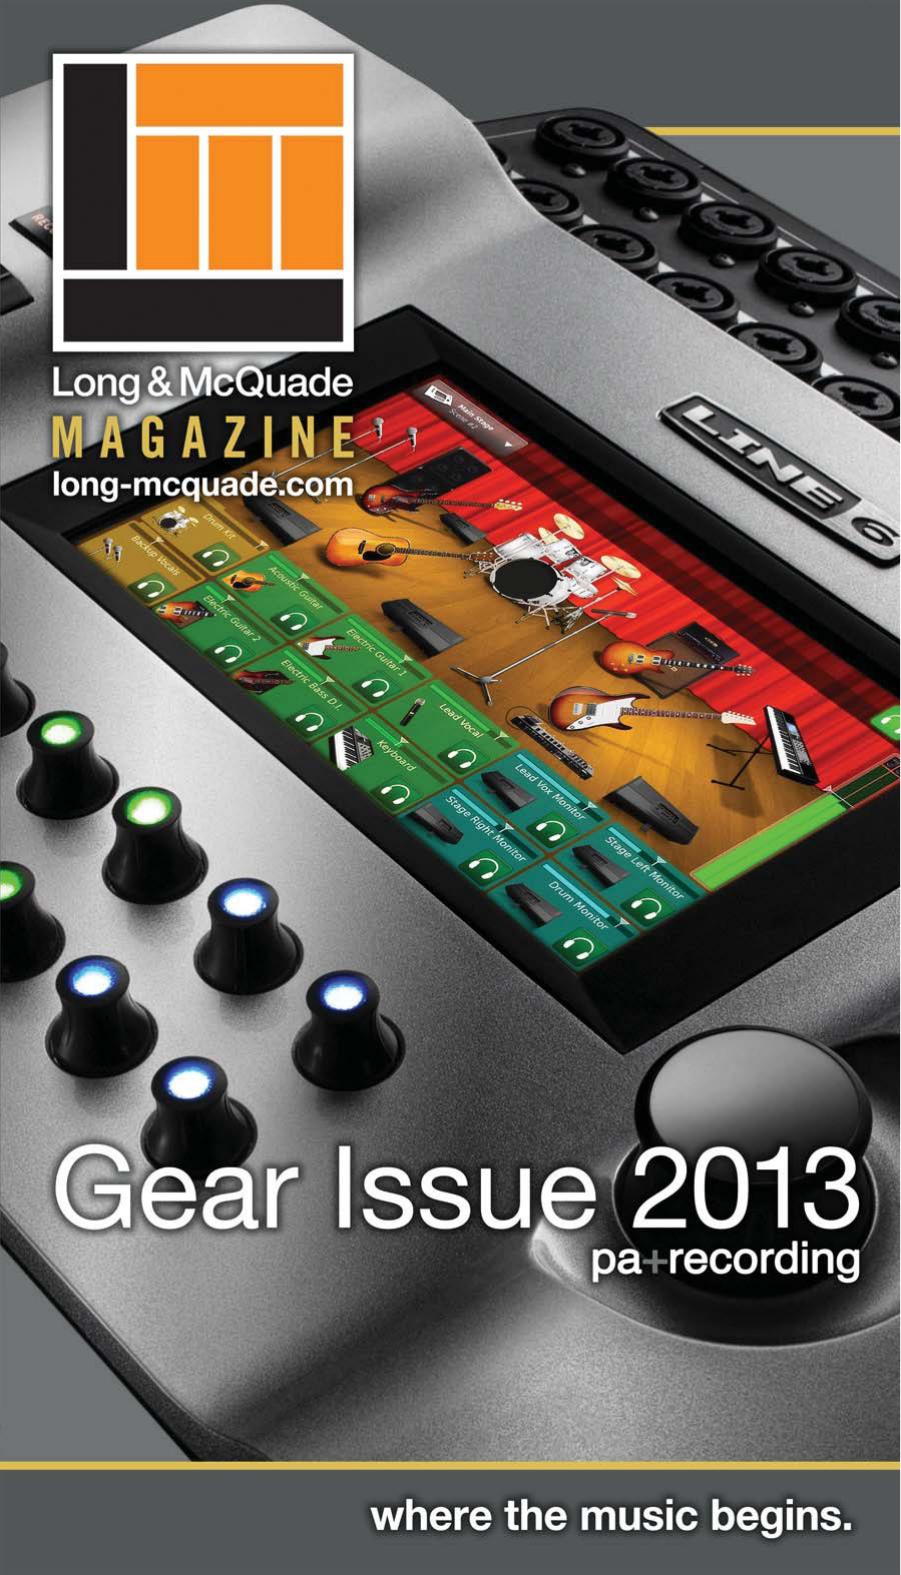 Gear Issue 2013 - PA + Recording | manualzz com